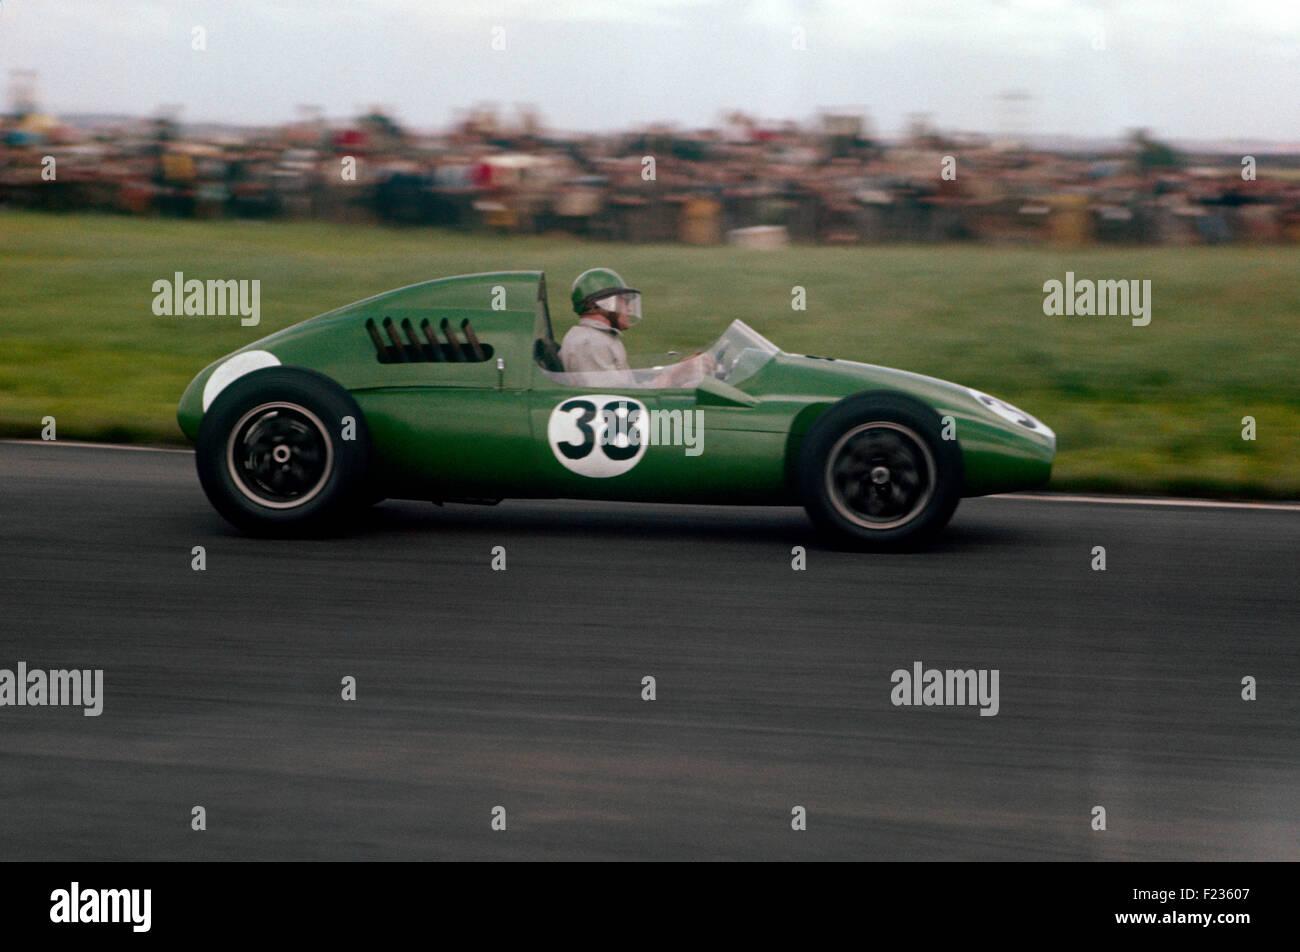 Rear engined Cooper BG Bristol 38 Bob Gerard at British GP meeting Aintree, 20th July 1957 - Stock Image